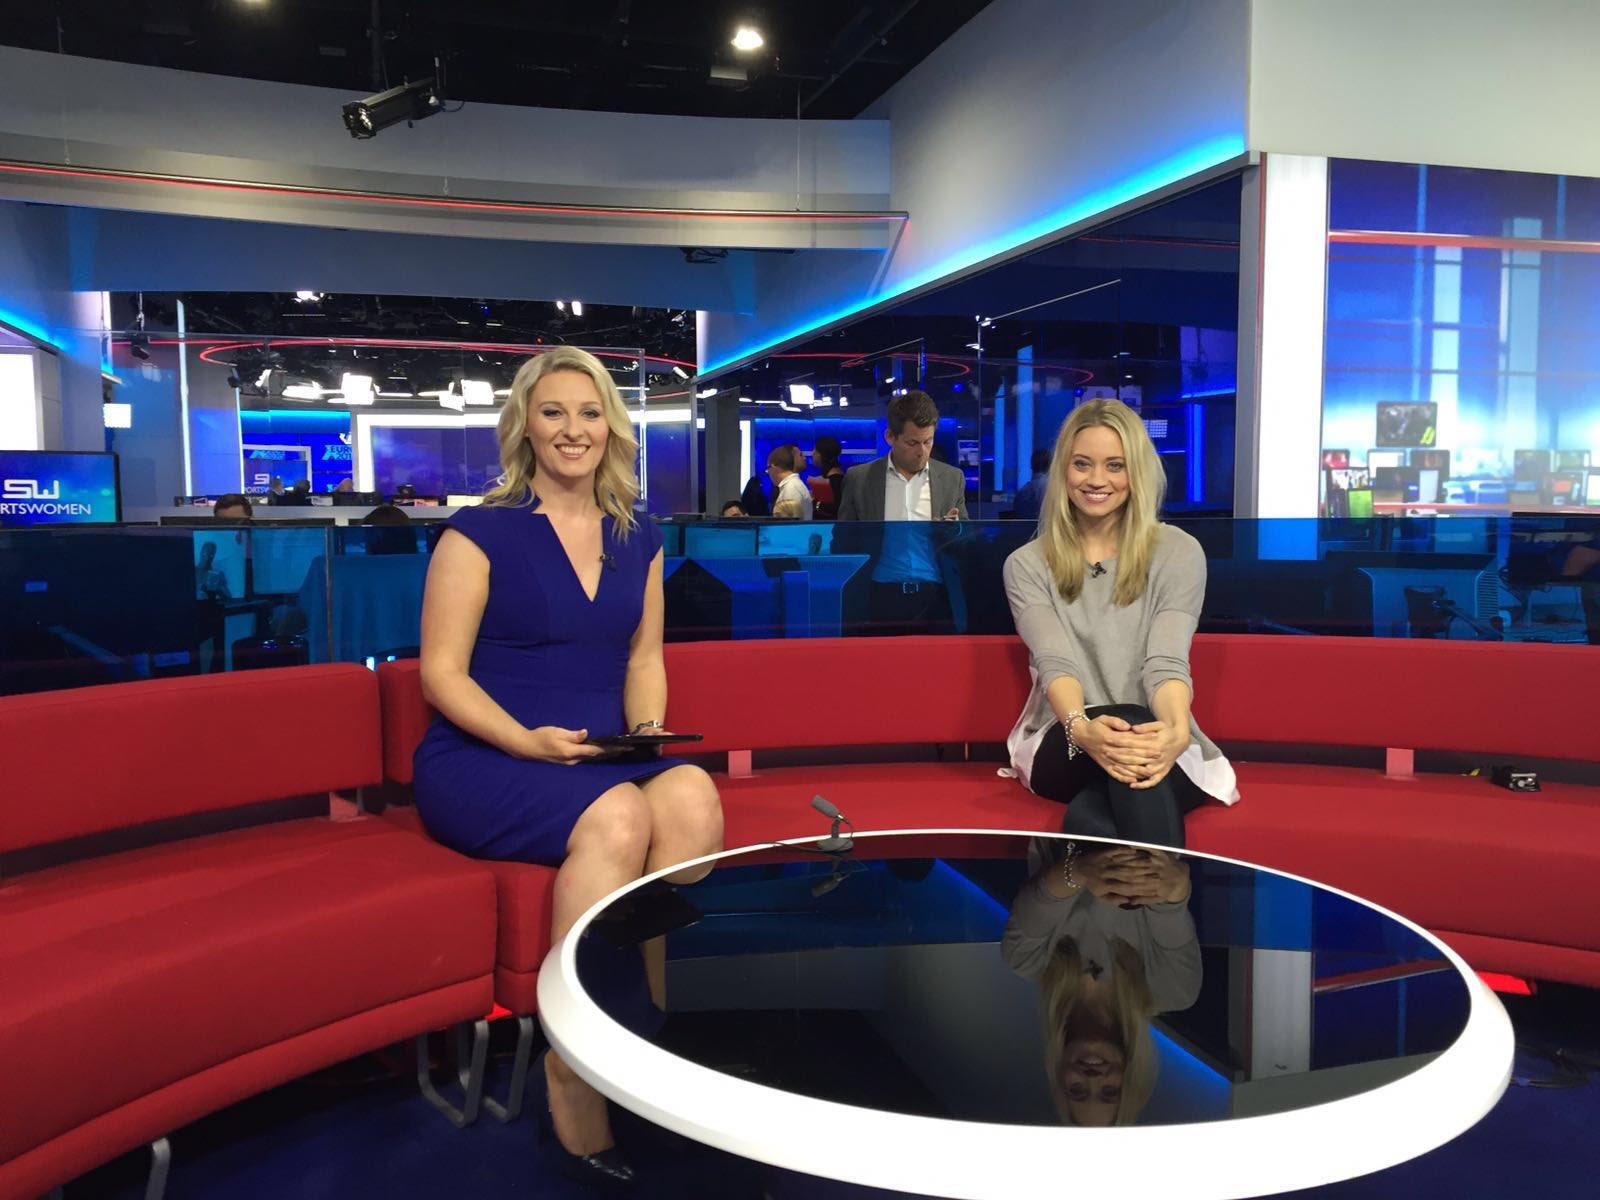 Thanks for having me @SkySportsNewsHQ !! #womensport #wellfit https://t.co/Gld6hLBQJ5